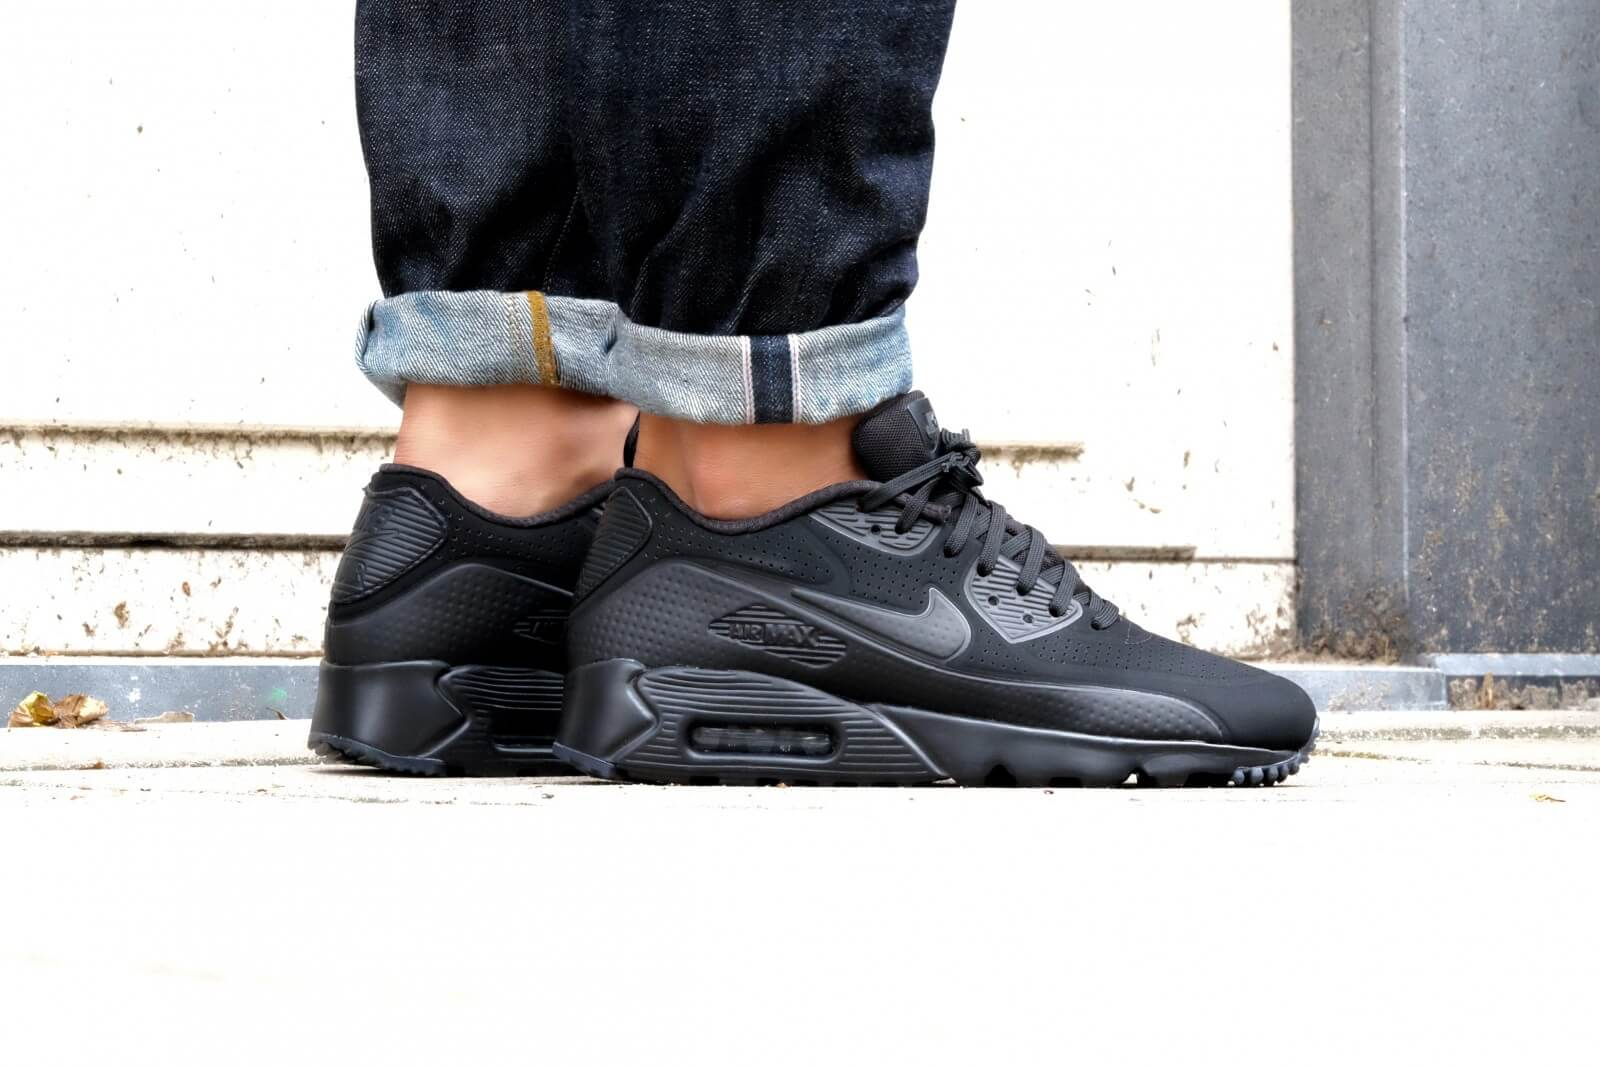 Nike Air Max 90 Ultra Moire Blackout 819477 010